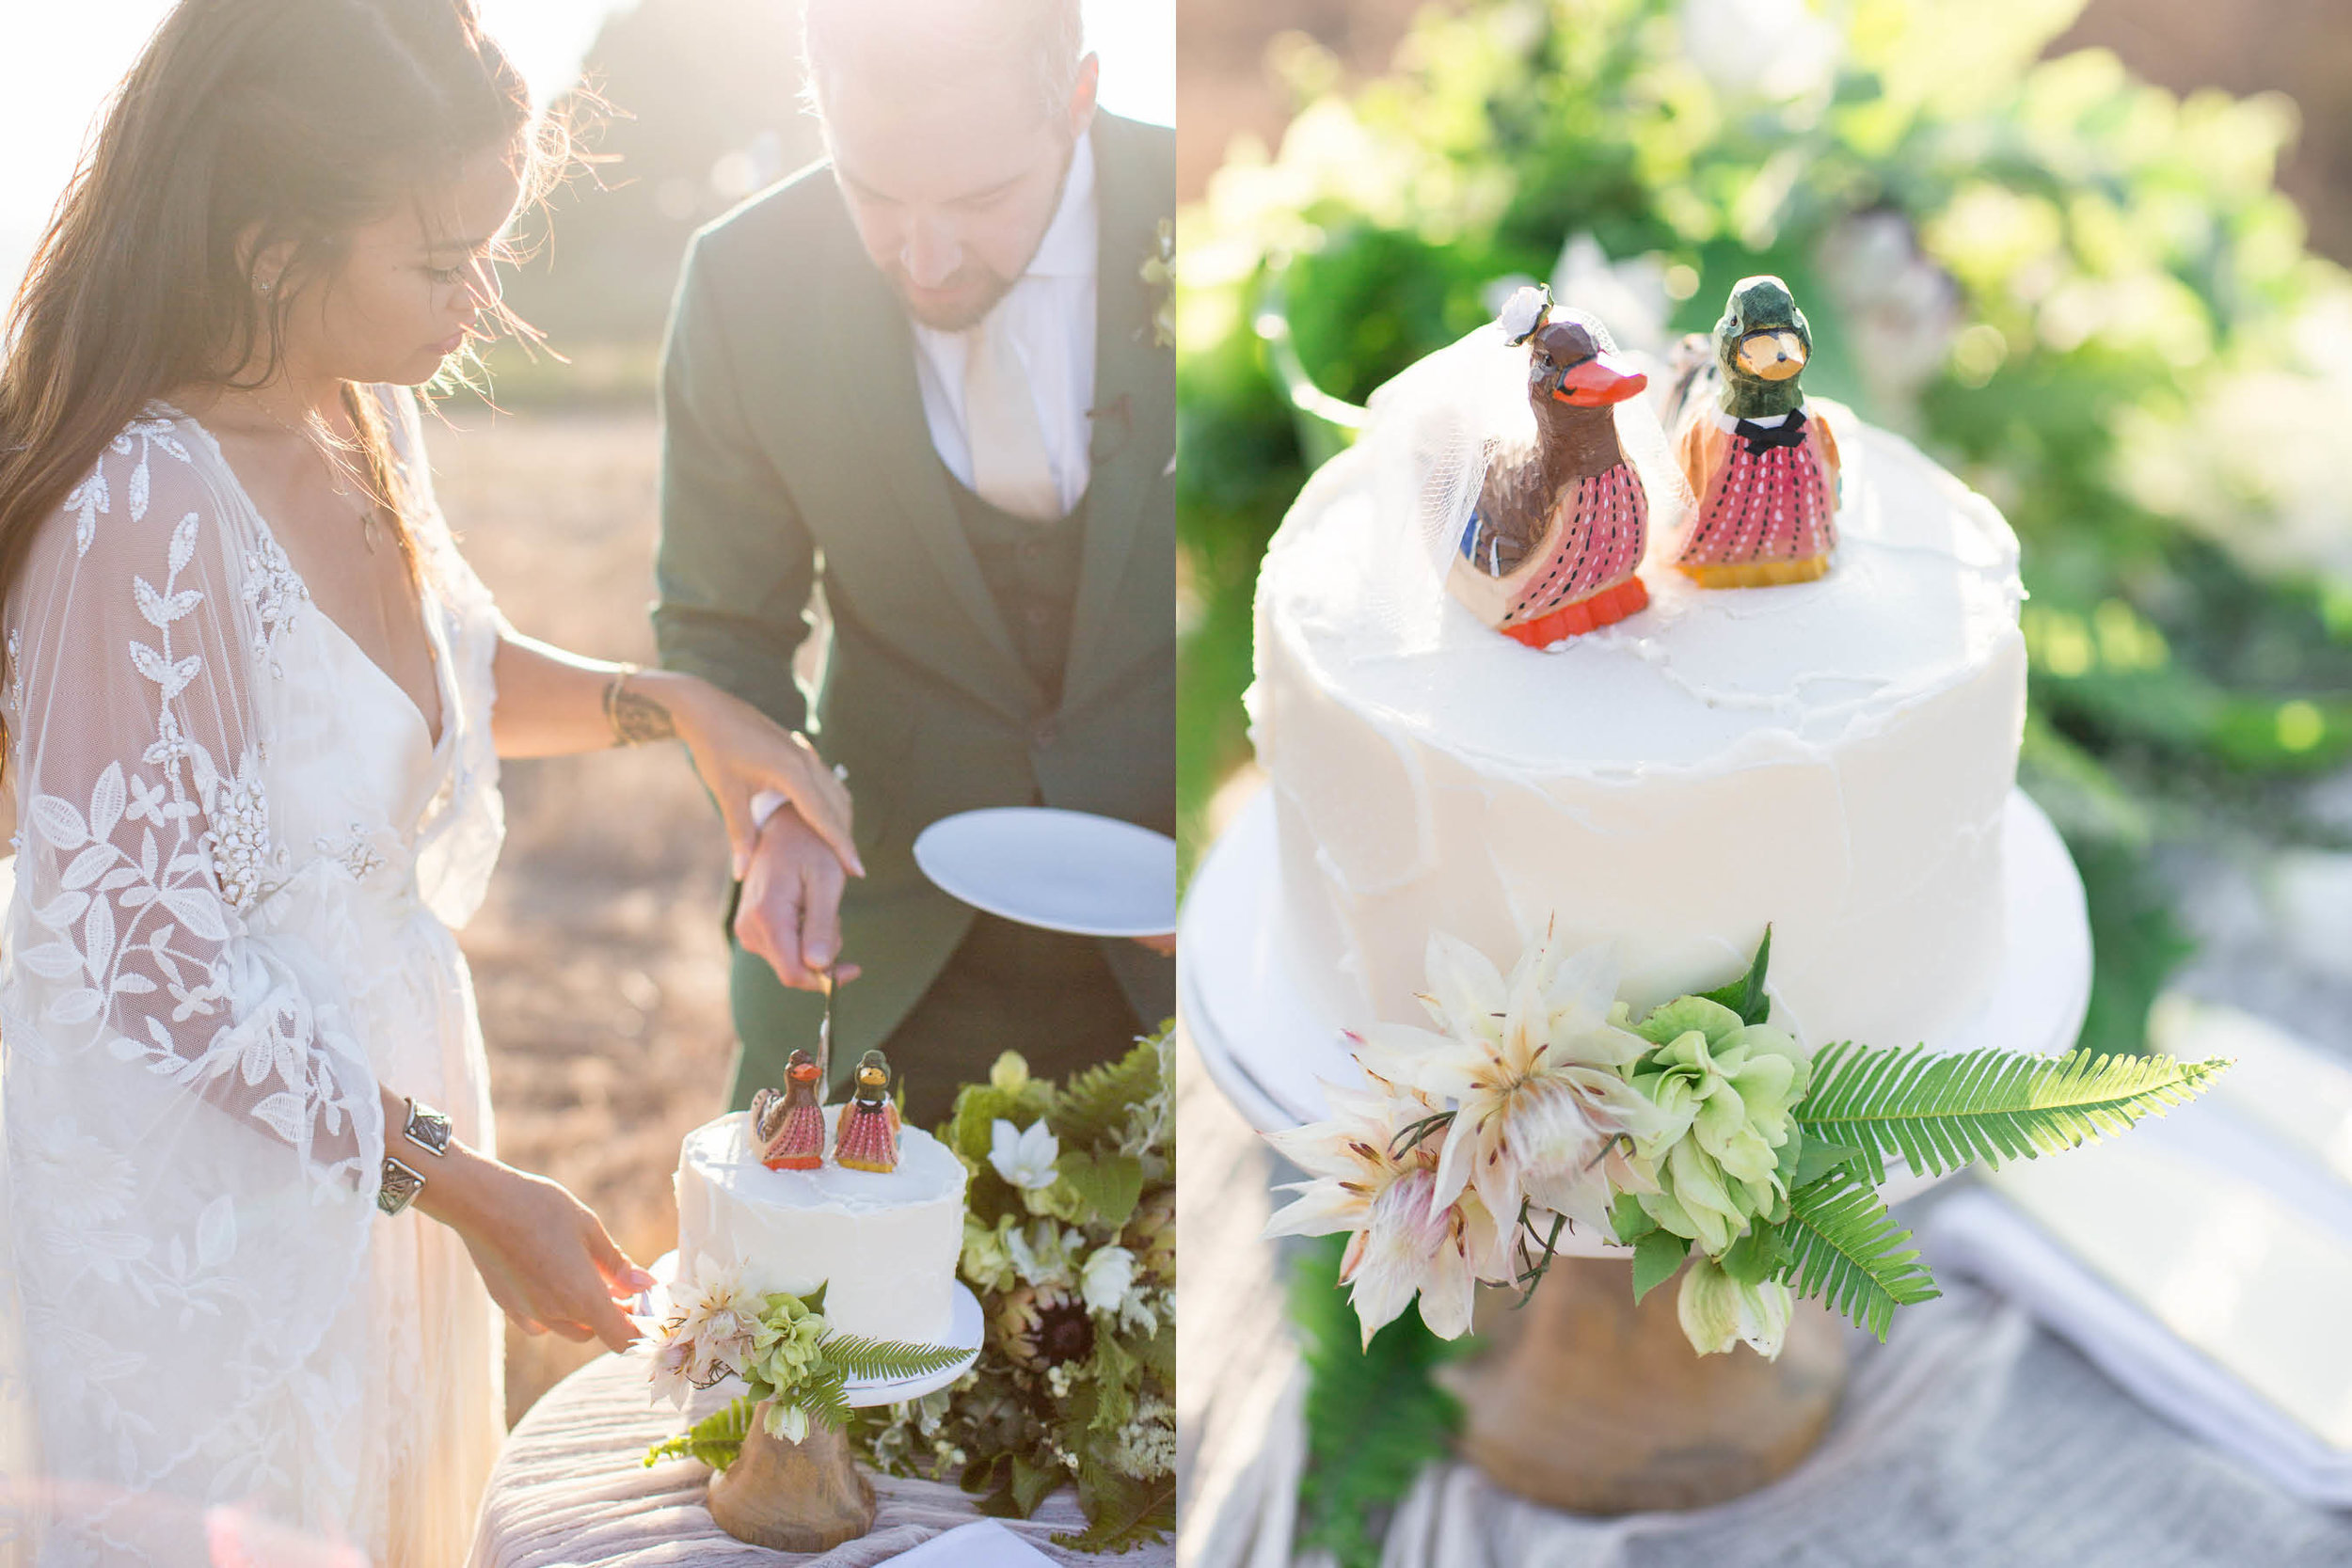 santa-barbara-elopement-elope-wedding-pop-up-coordinator-day-of-event-planning-planner-ellwood-bluff-eucalyptus-grove-rustic-ocean-view-front-hop-green-suit (1 (19).jpg